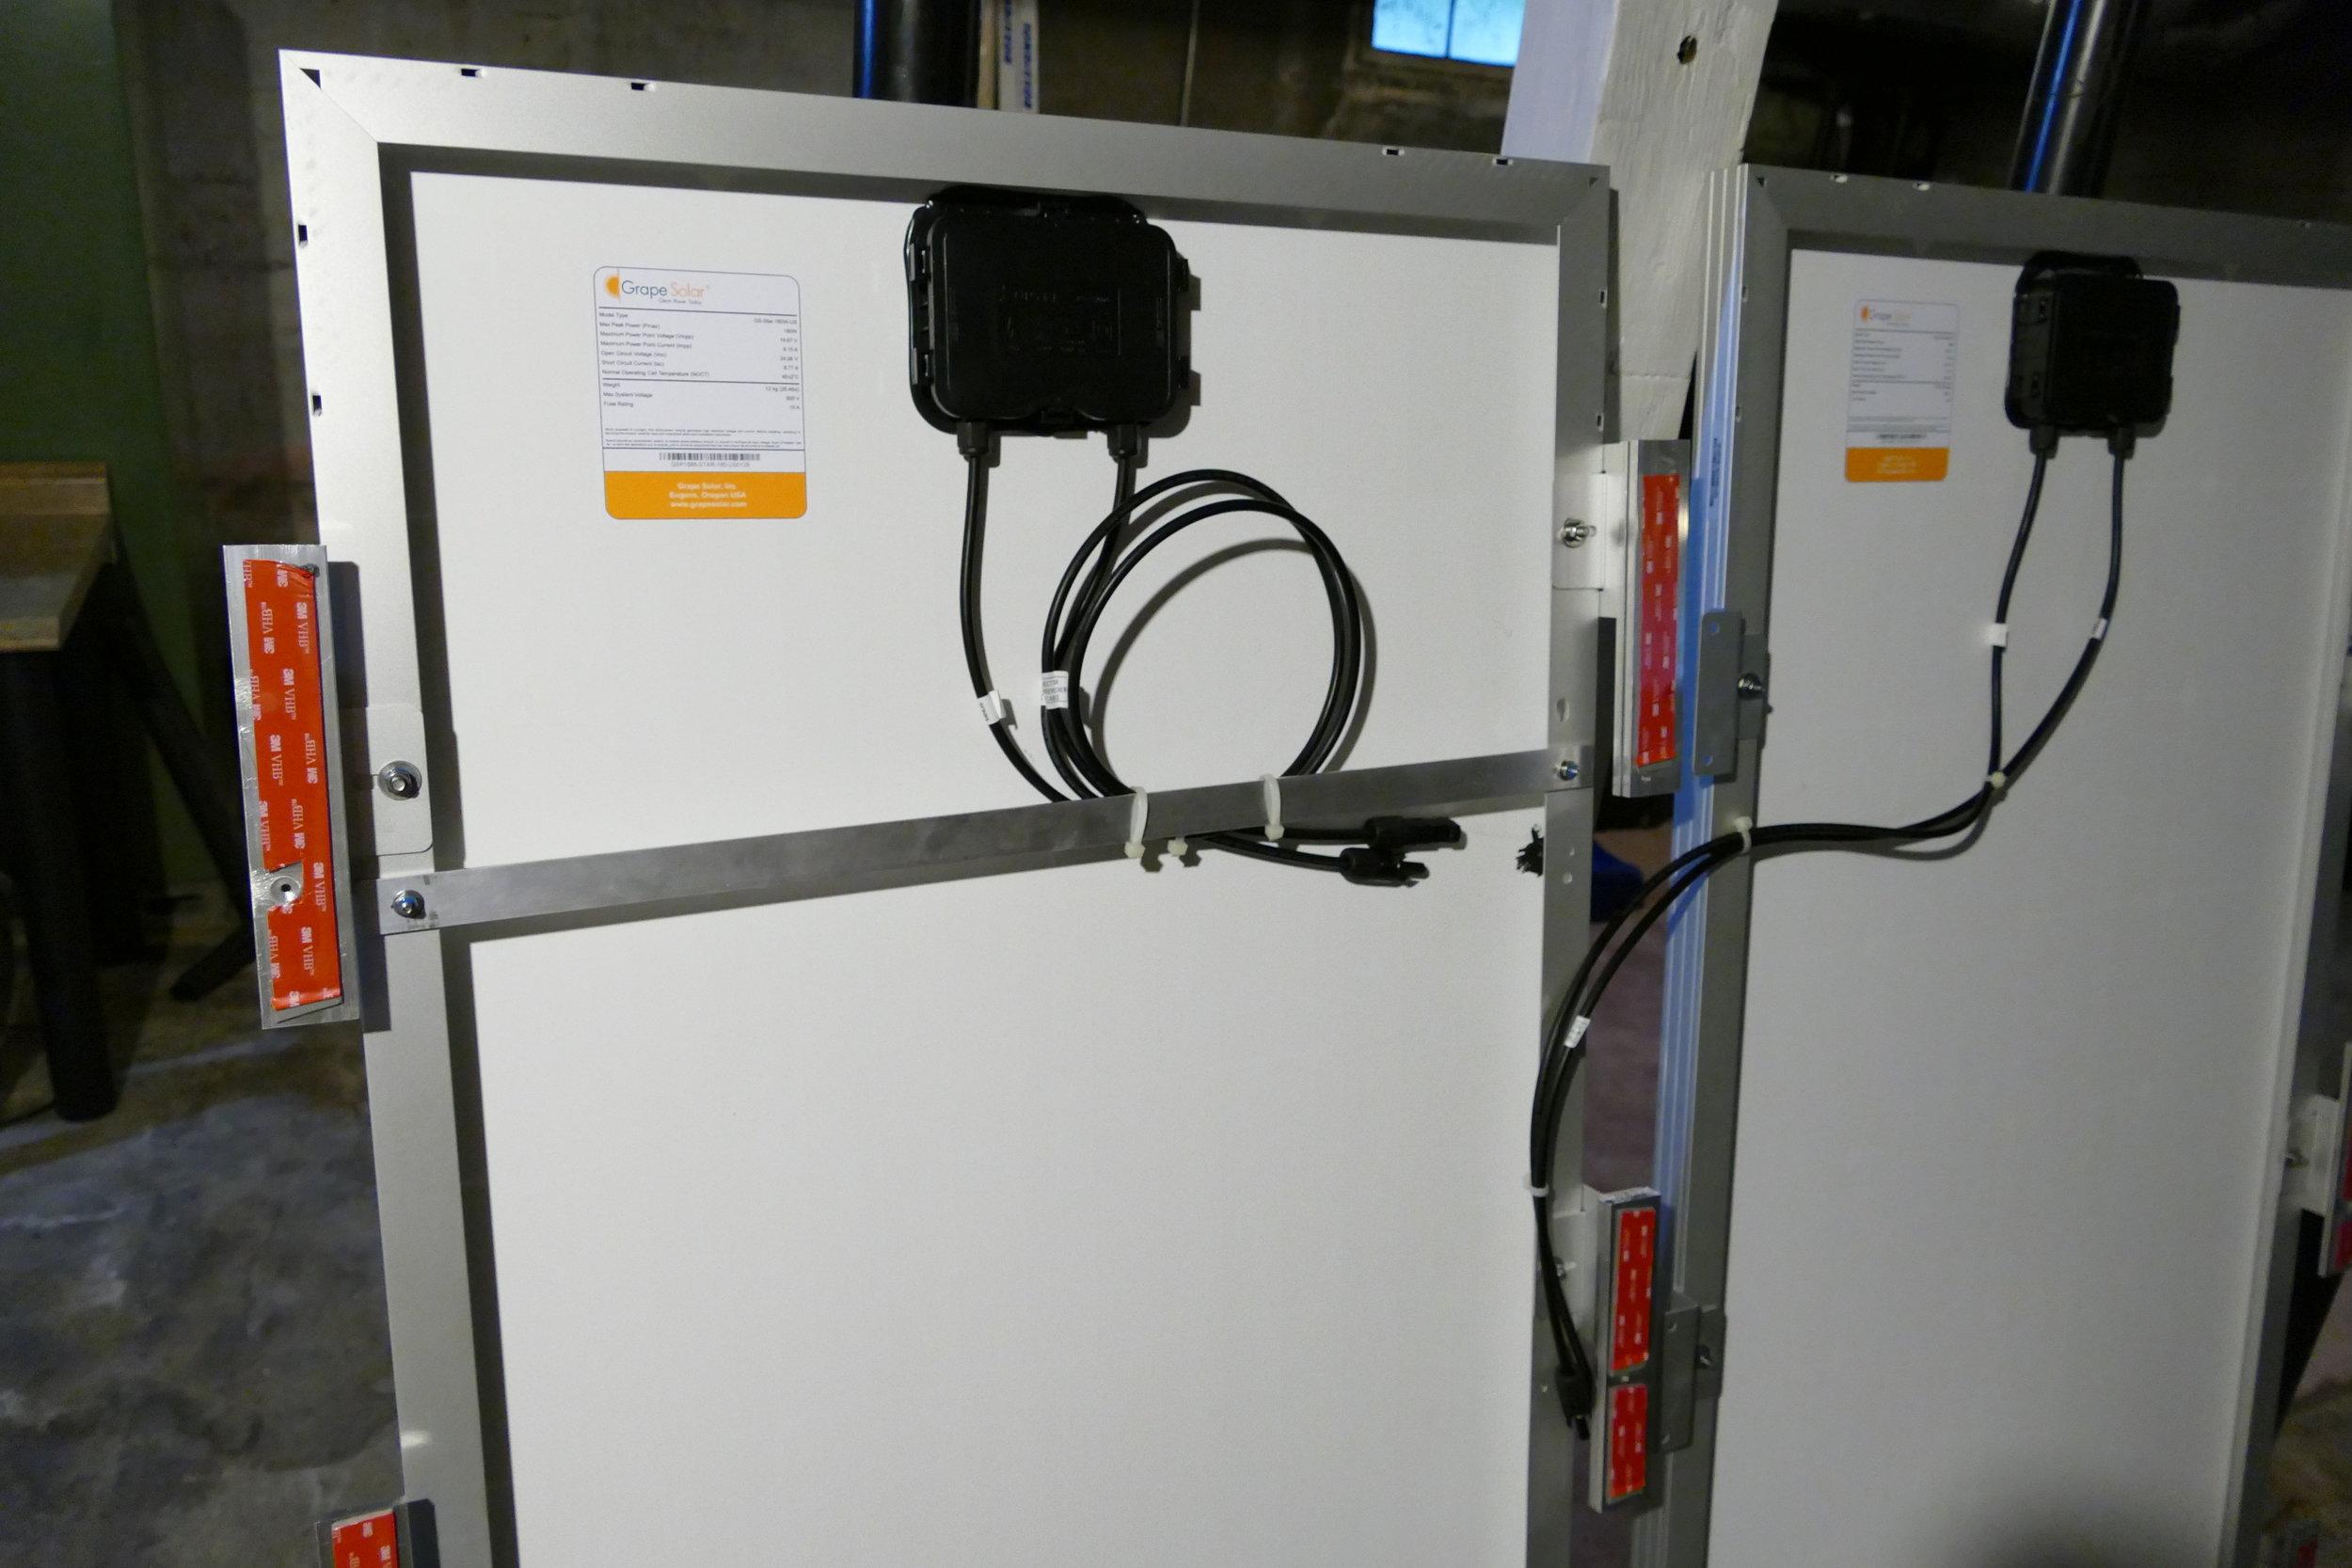 P1000431.JPG